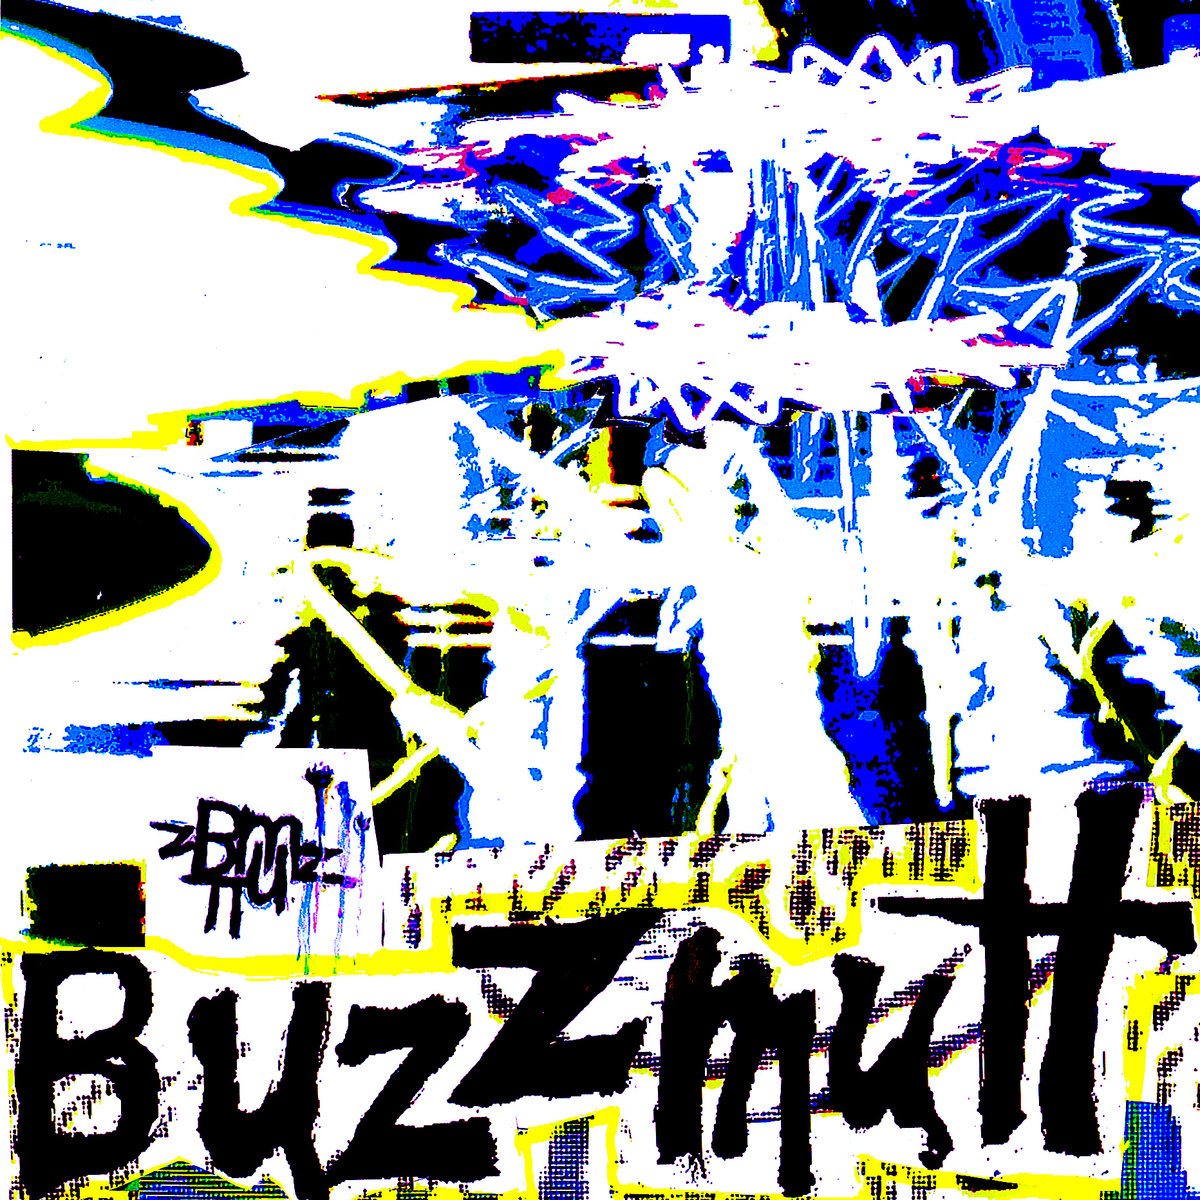 Buzzmutt 'Strange Planes of surveillance' (san francisco, 2014)